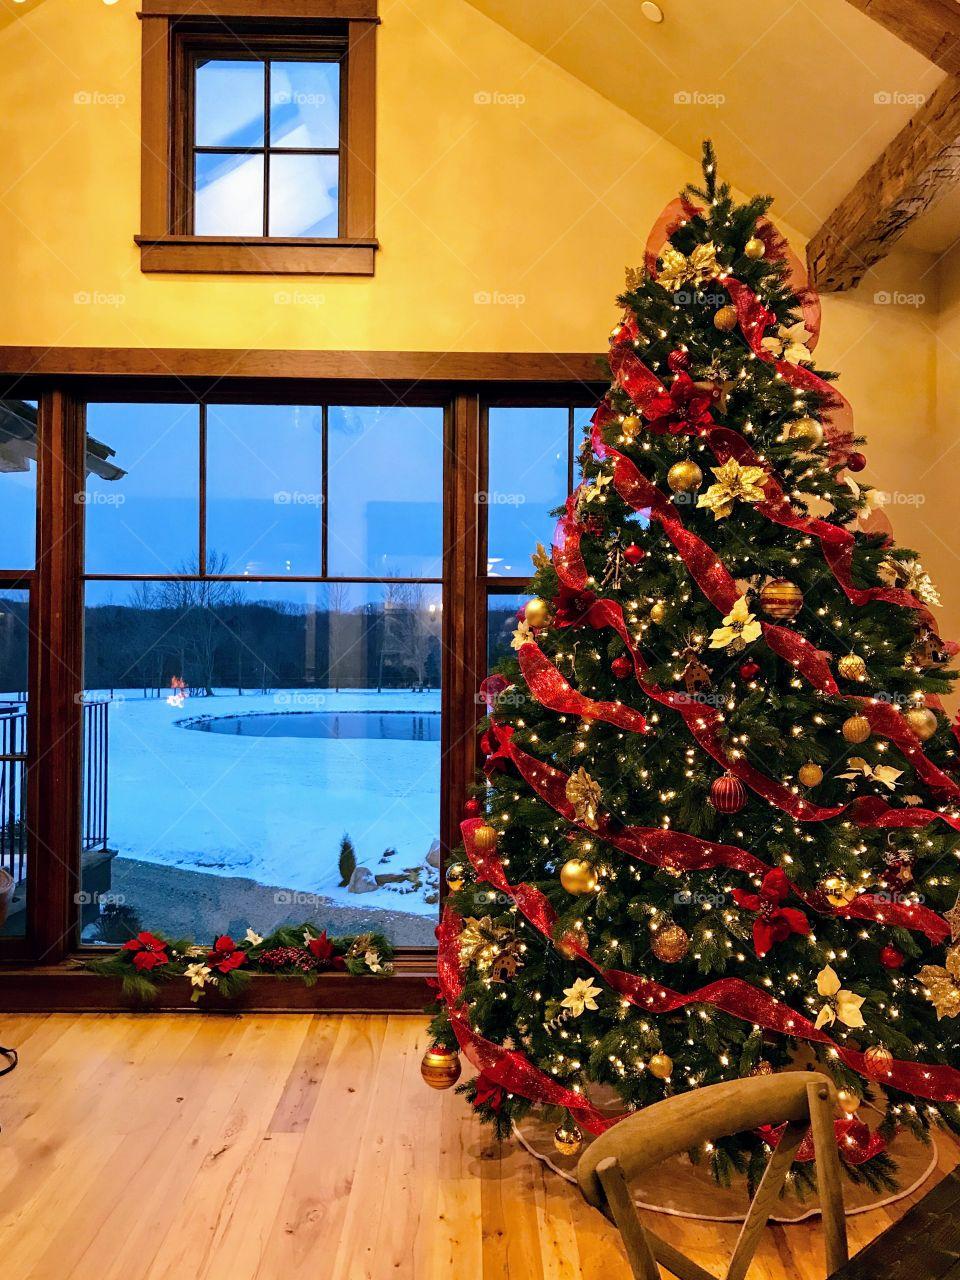 Christmas in NE Ohio, USA